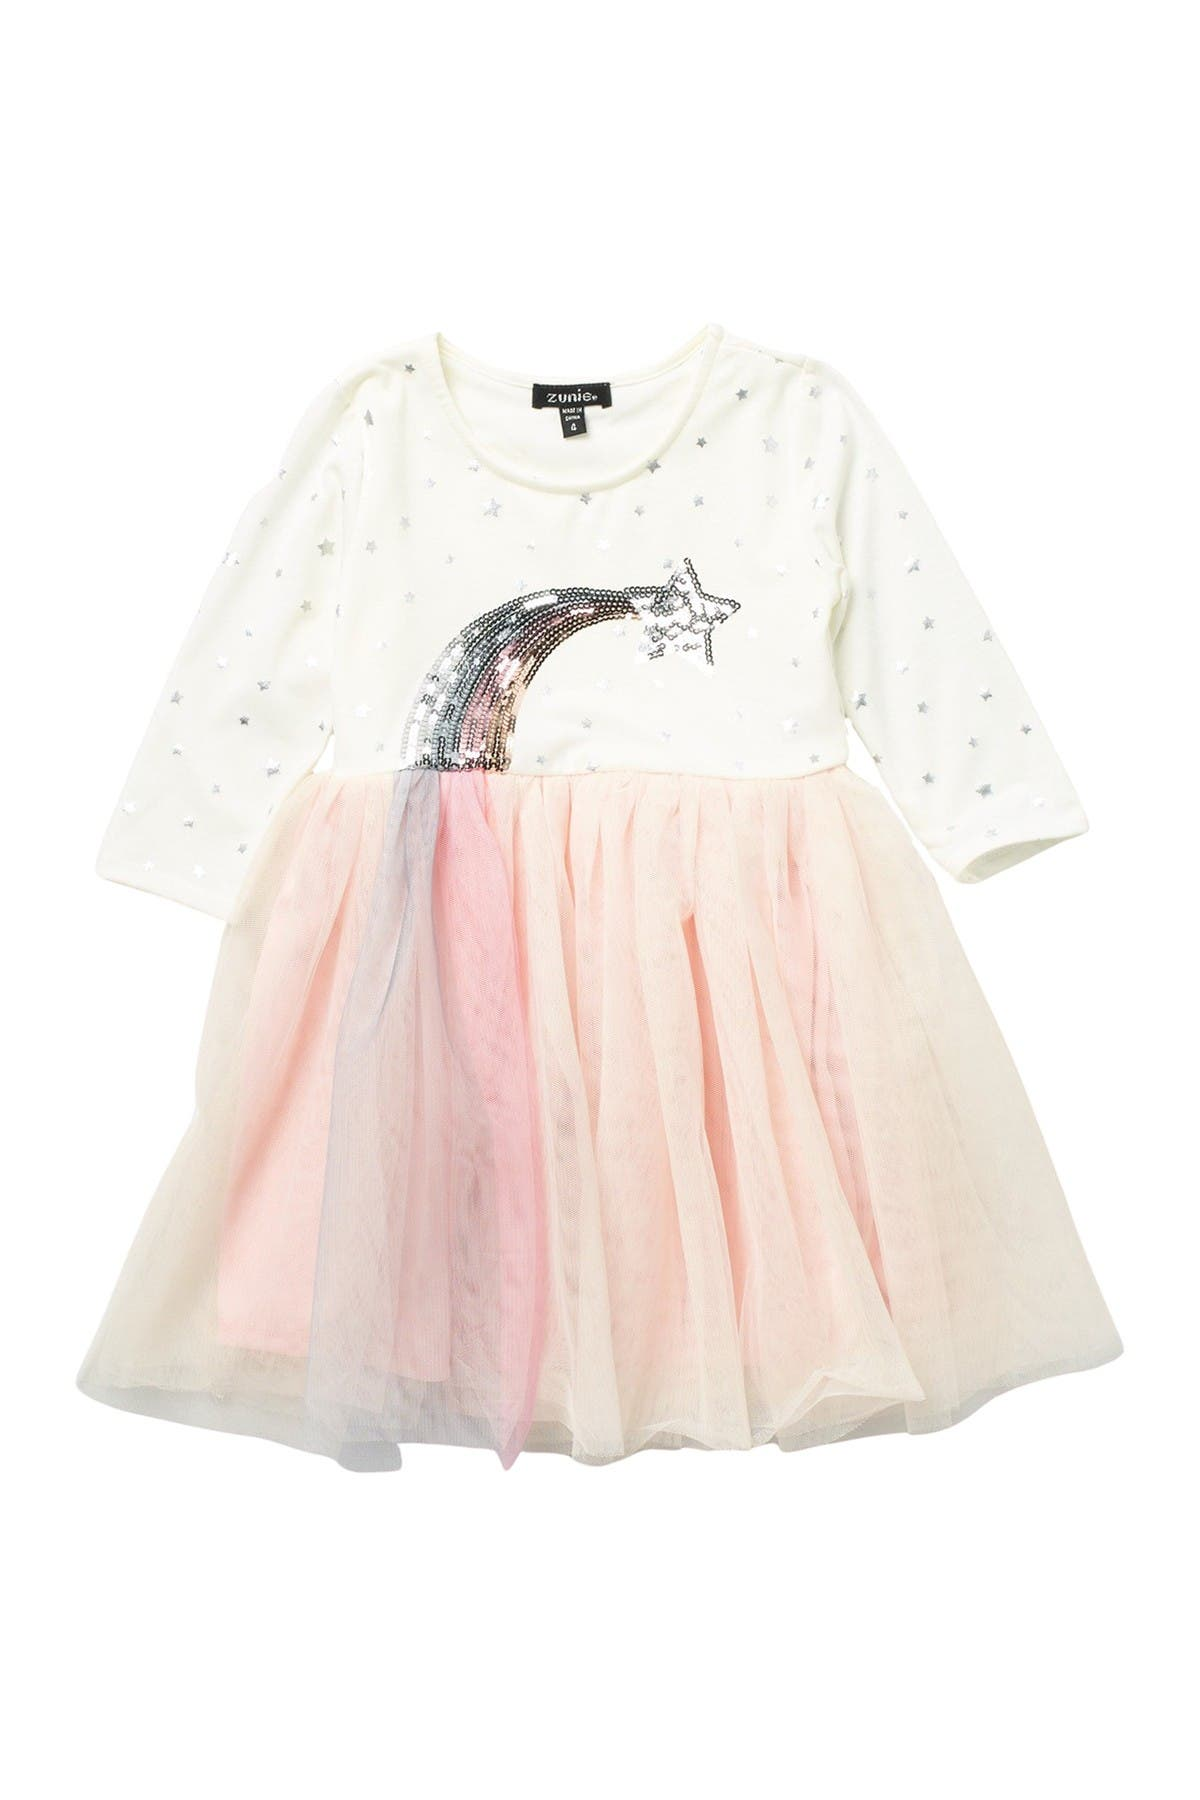 Image of Zunie 3/4 Sleeve Tutu Sequin Star Dress